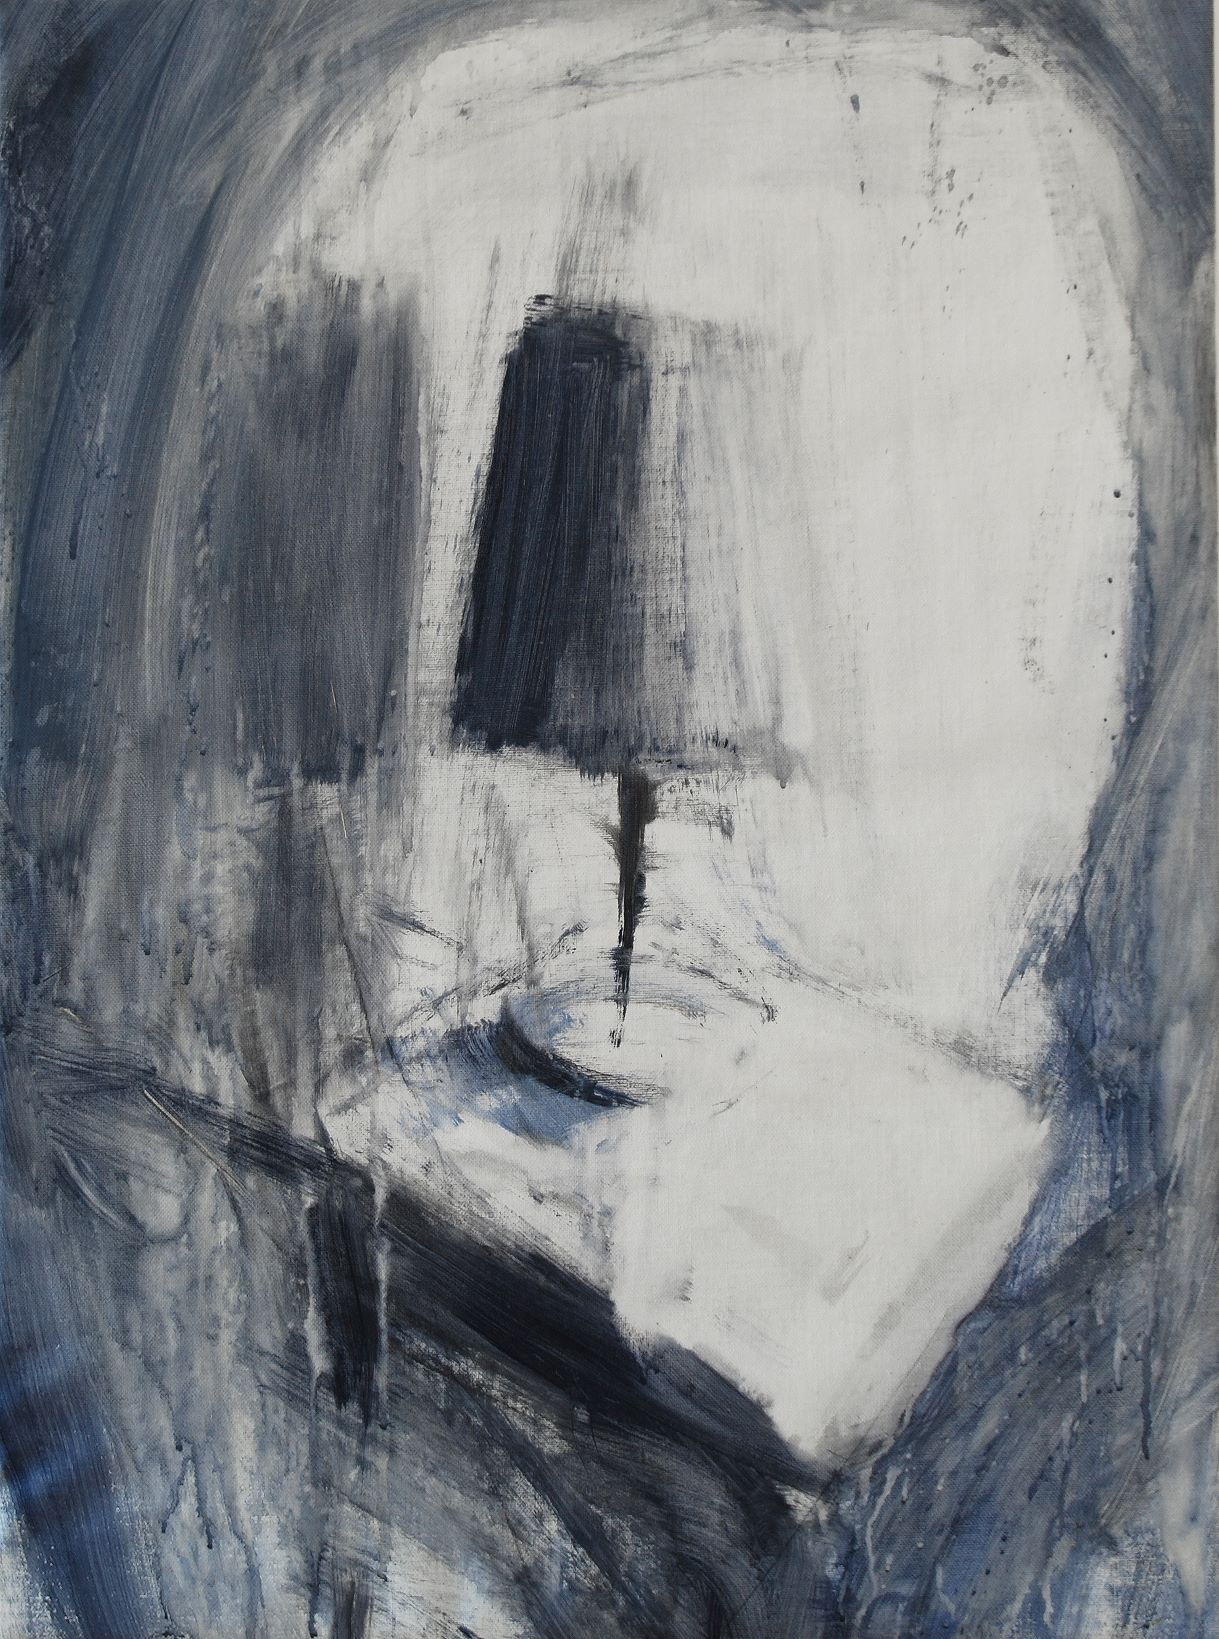 Lume 2013 - acrilico su tela 60x80 cm